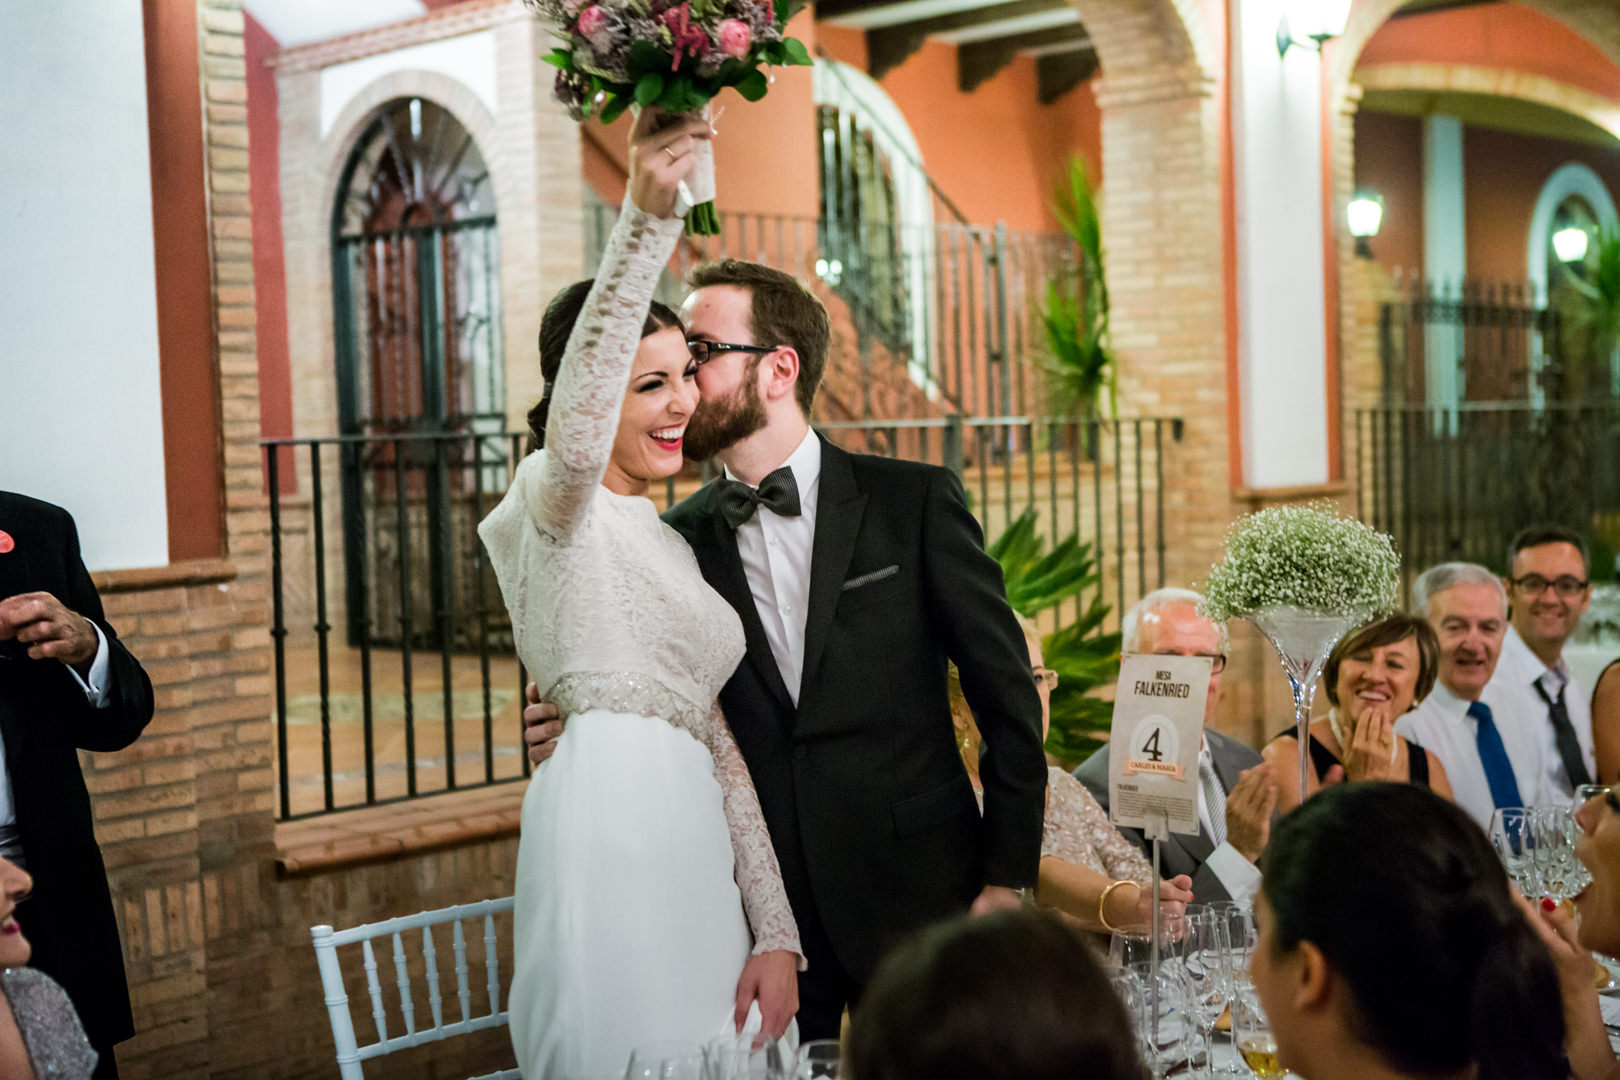 Boda-Sevilla-Museo-Carmona-Hamburgo-Maria-Carles-engagement-Rafael-Torres-fotografo-bodas-sevilla-madrid-barcelona-wedding-photographer--35.jpg